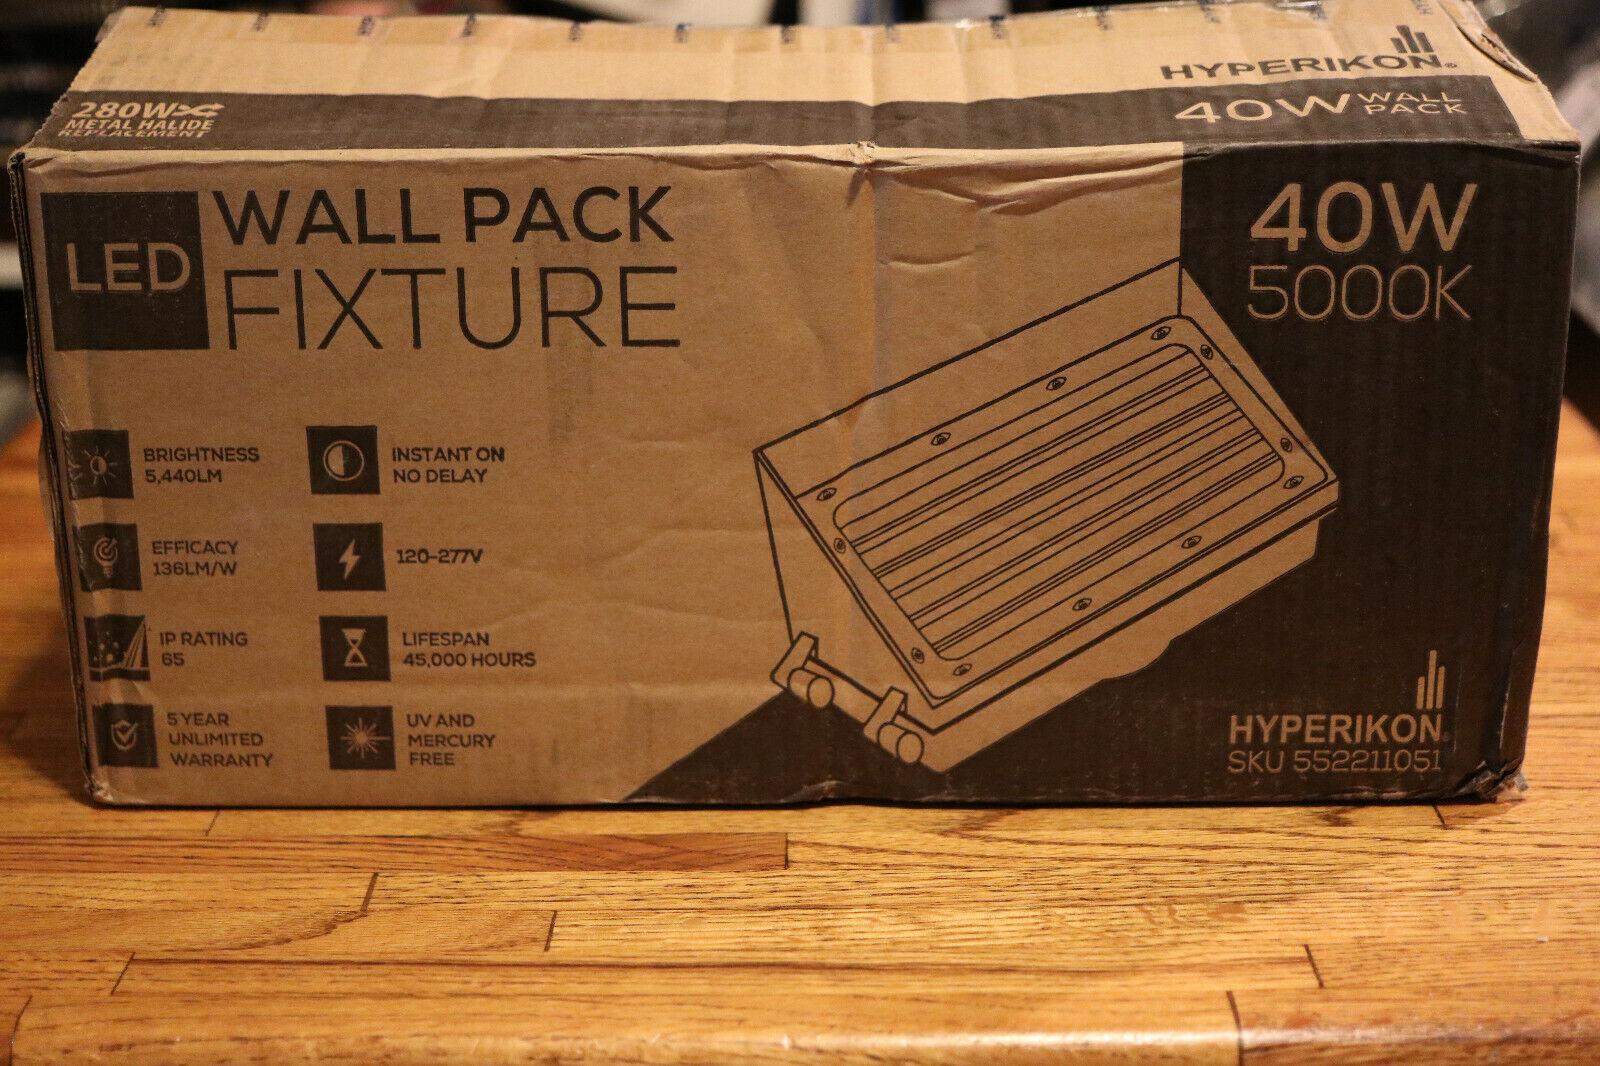 Hyperikon LED Wall Pack Fixture 40W 5000K 280w metal halide